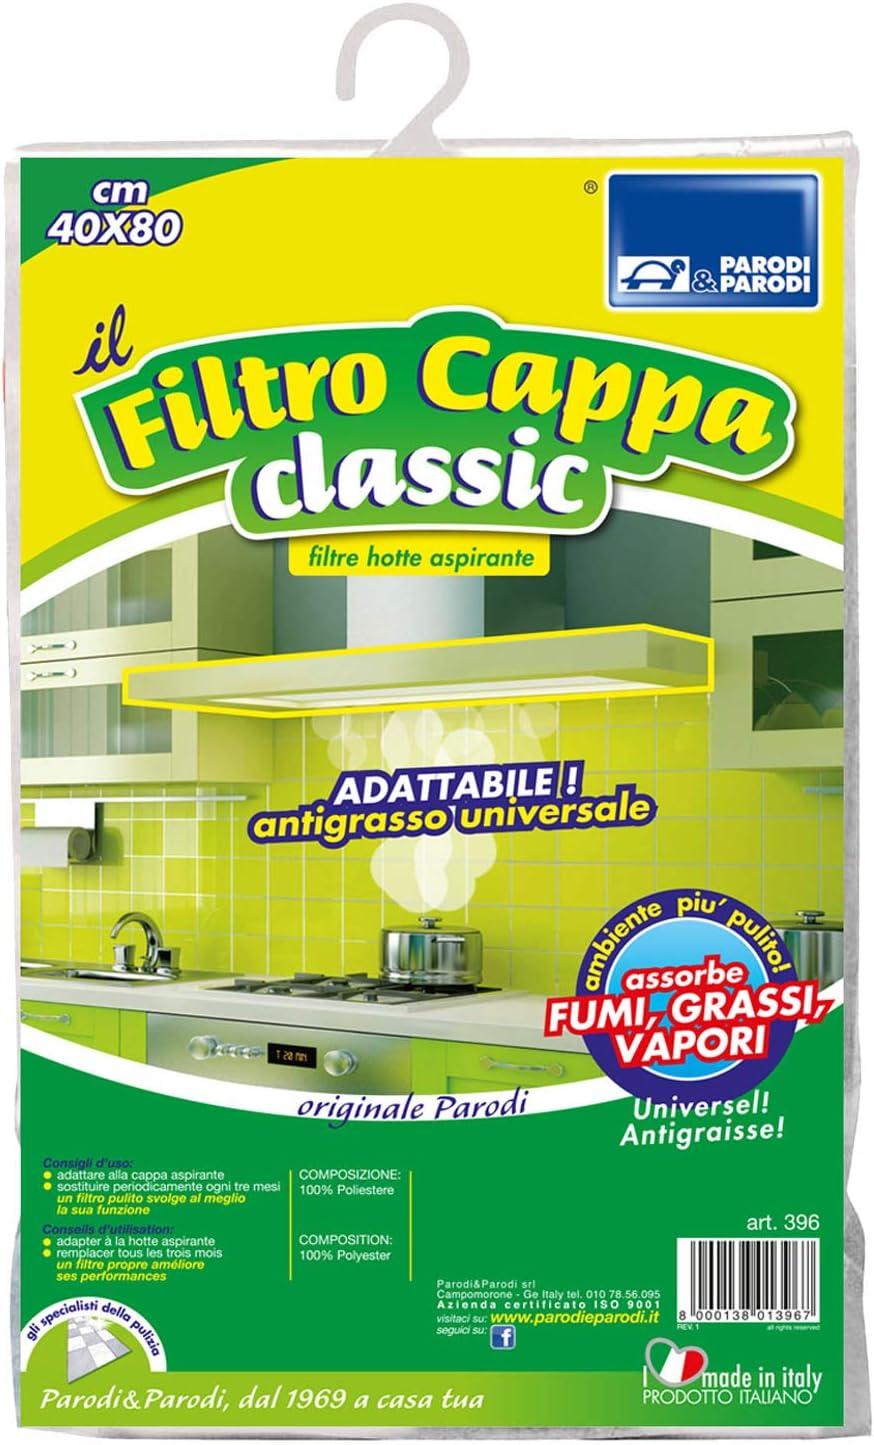 Parodi & Parodi Cappa Classic Filtro para Campanas extractoras, poliéster, Blanco, 20 x 26 x 5 cm